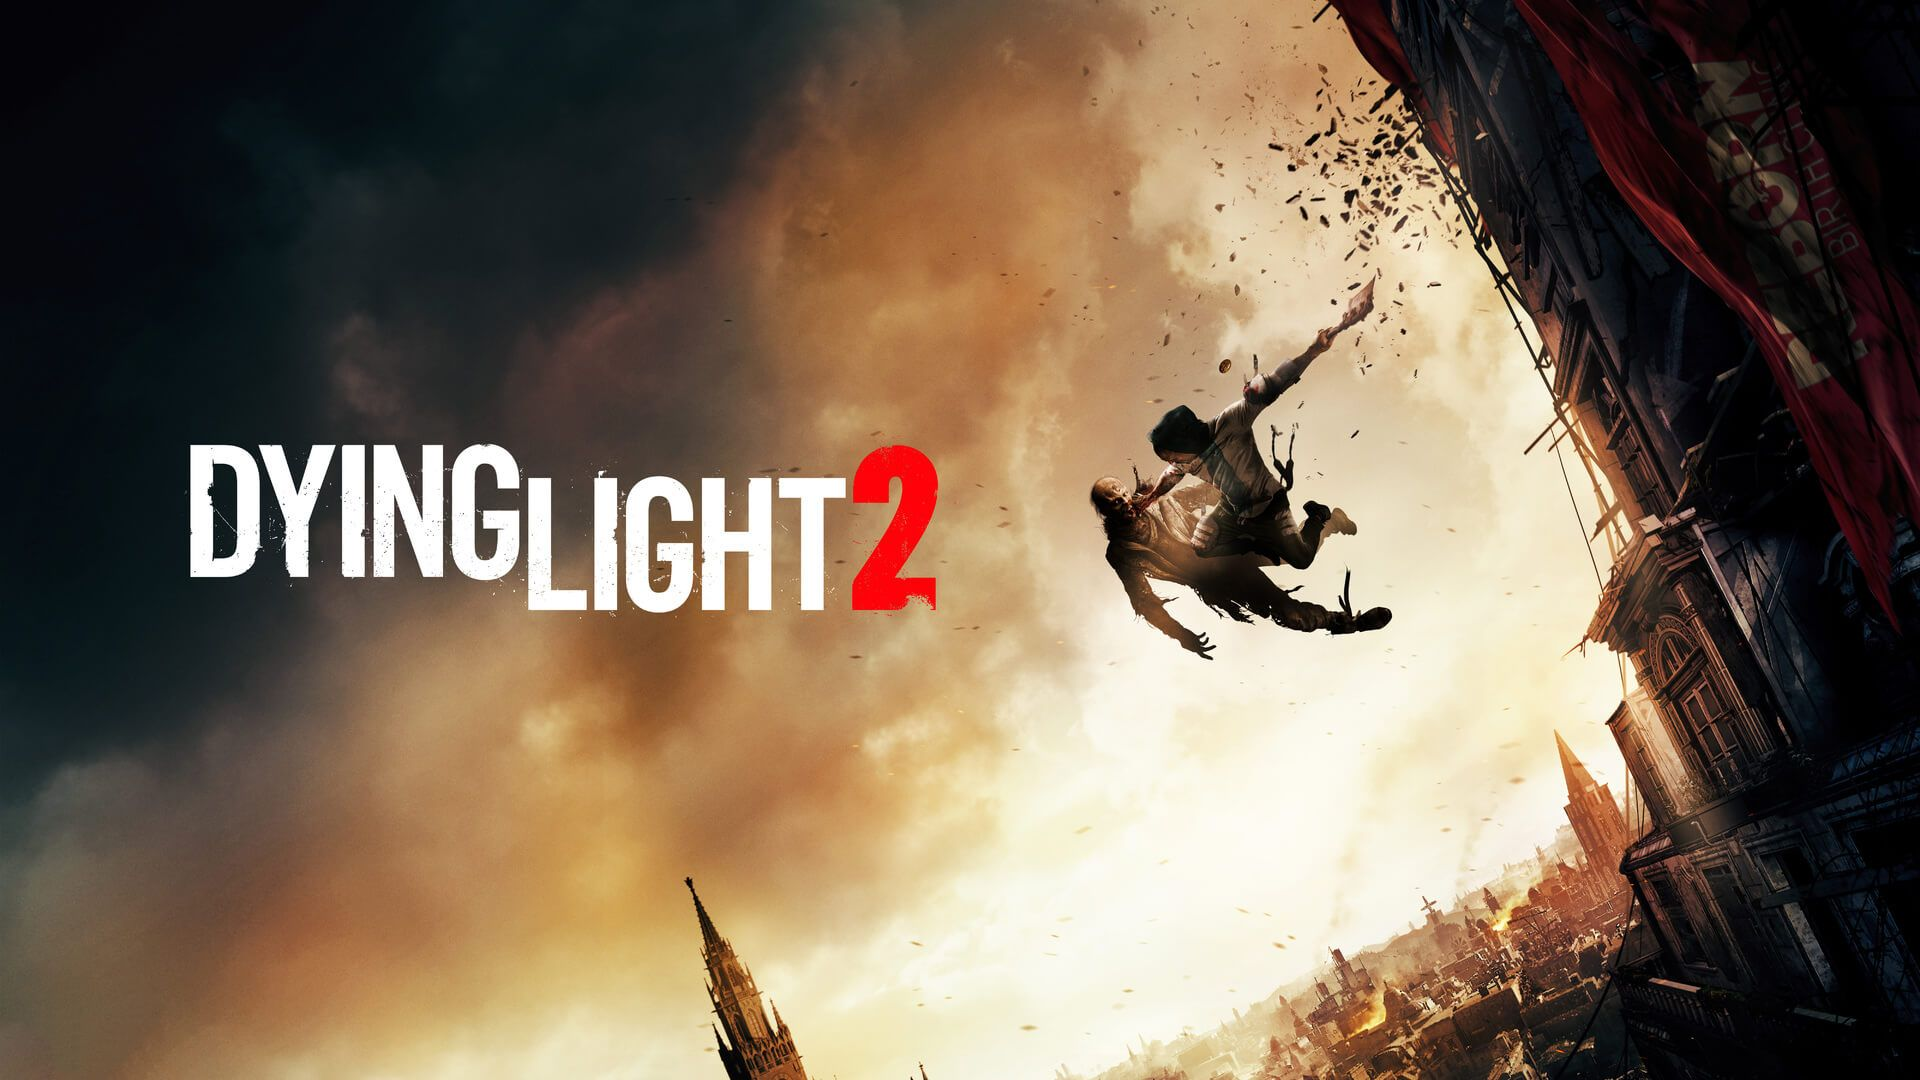 dying-light-2-8k-nm-1920x1080-1.jpg